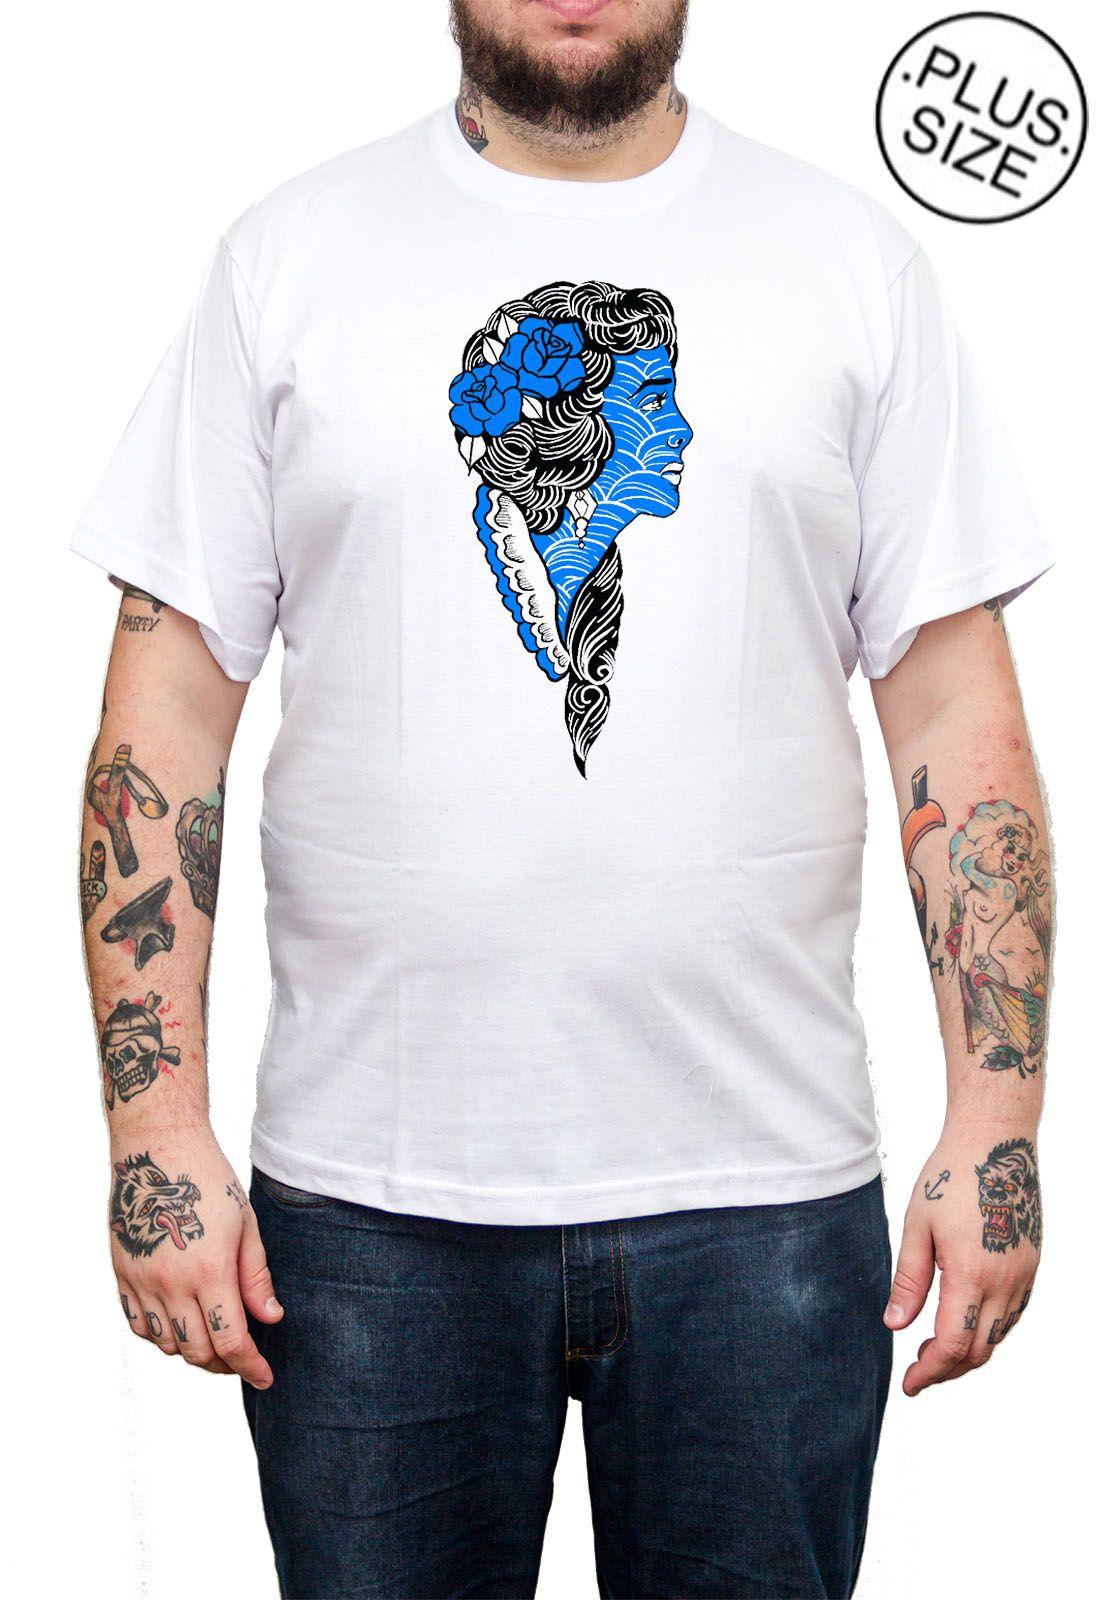 Camiseta Holdfast Bride - Branco - Plus Size - Tamanho Grande XG  - HShop